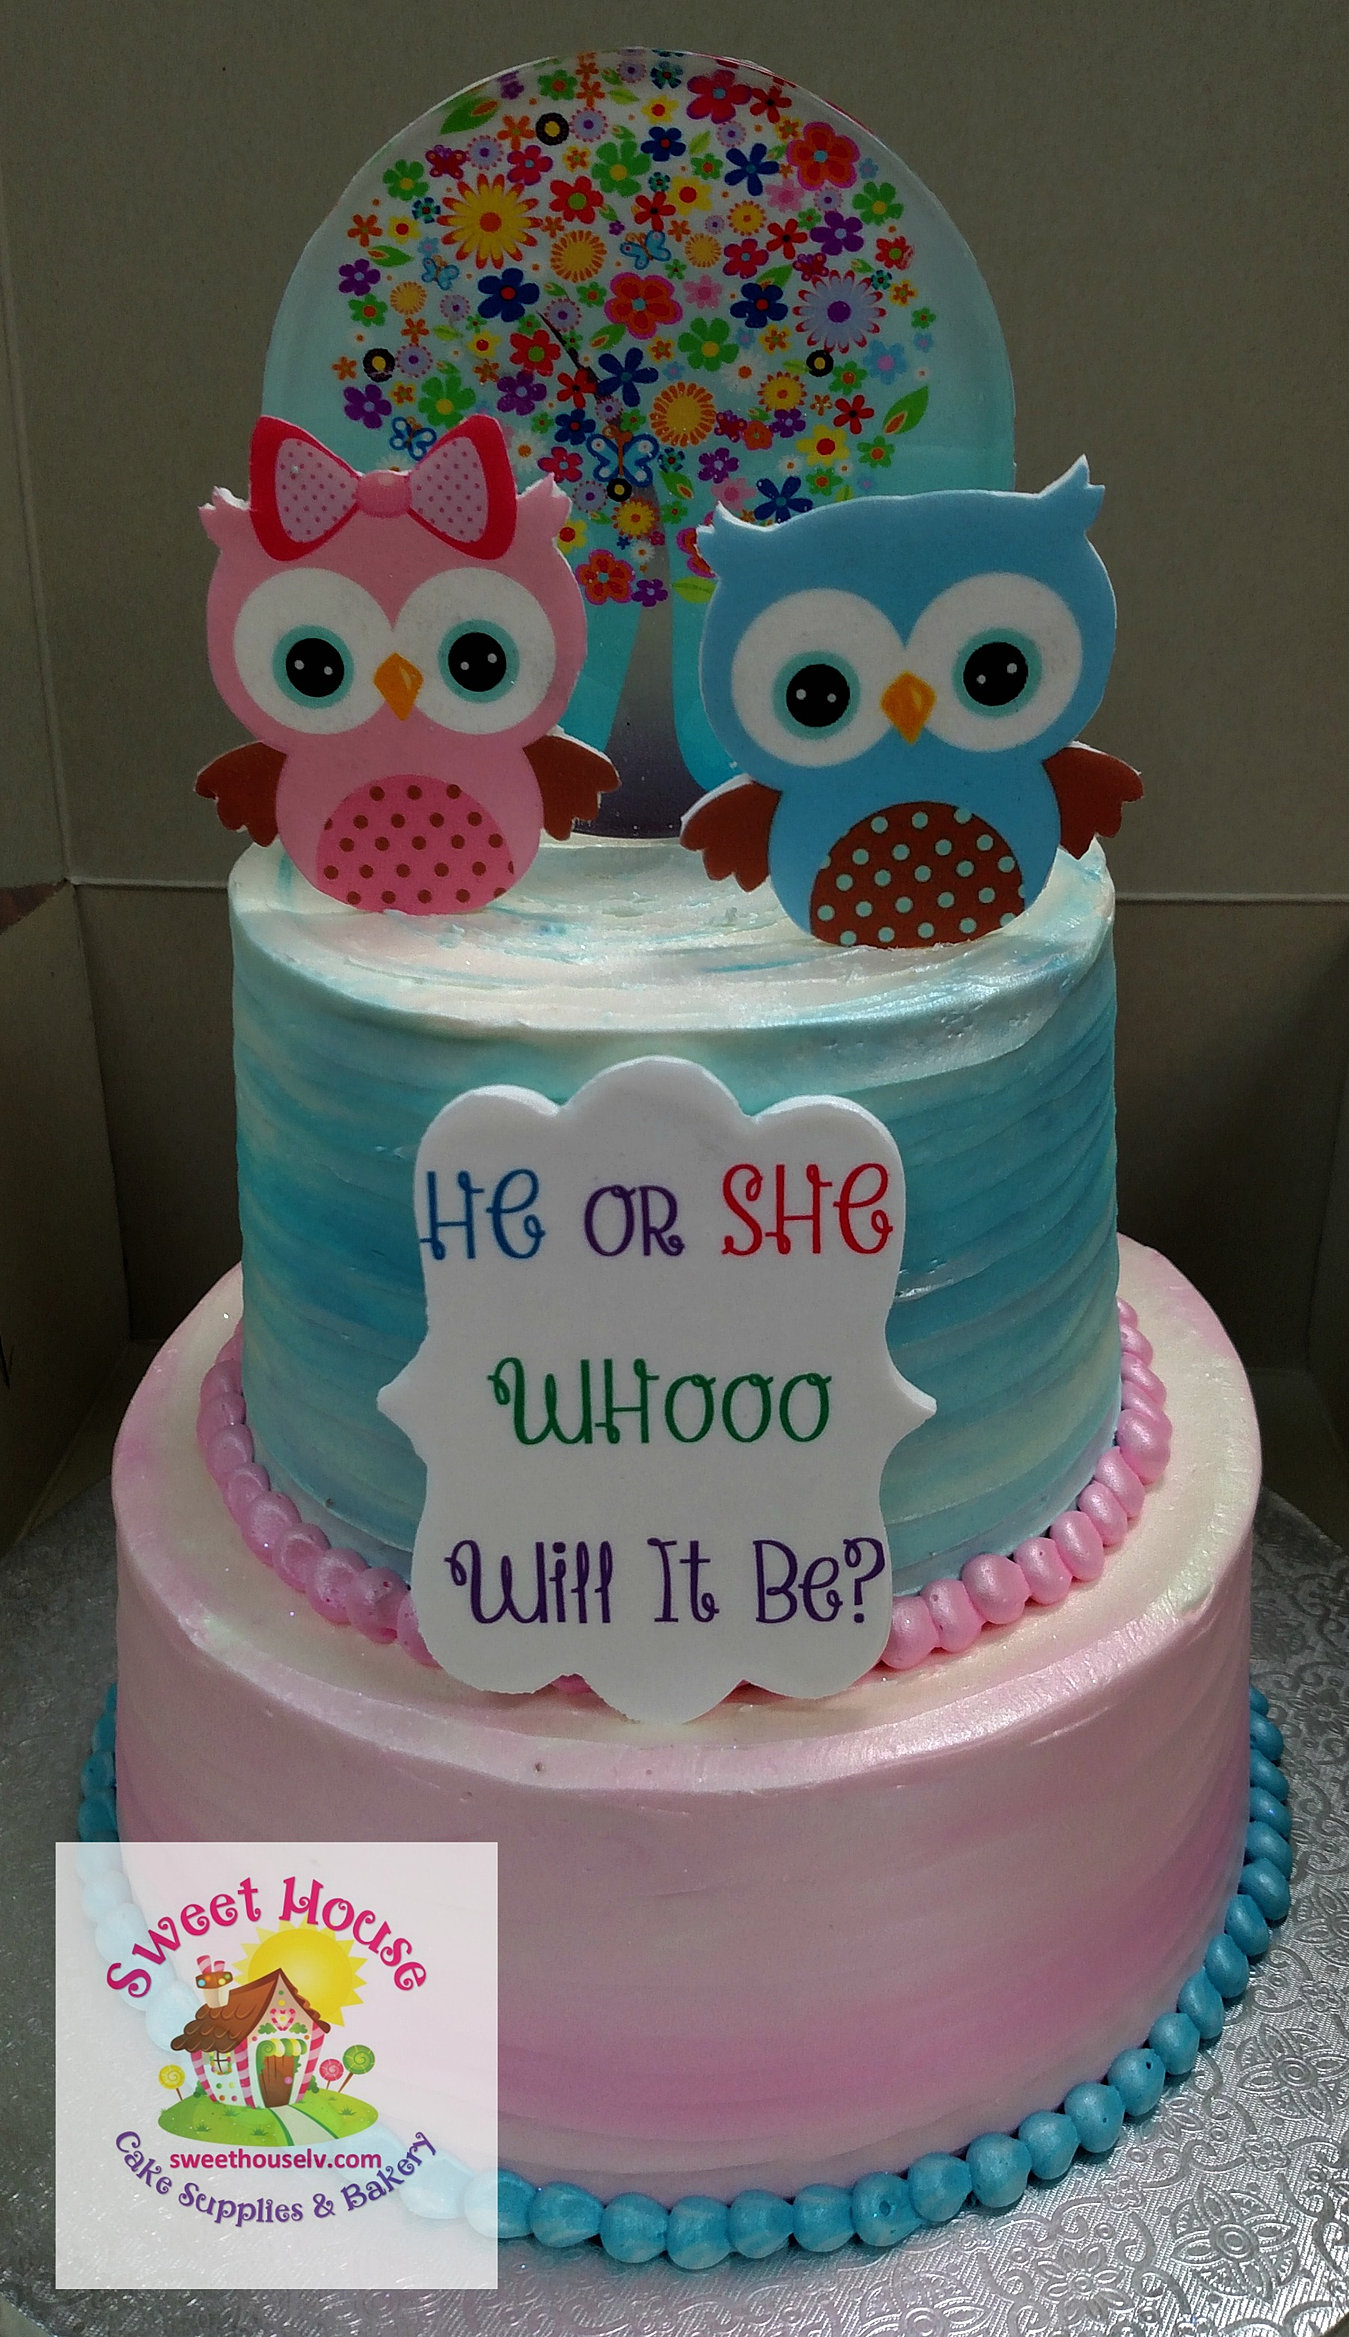 Sweet House Cake Supply & Bakery   Baby Shower Cakes